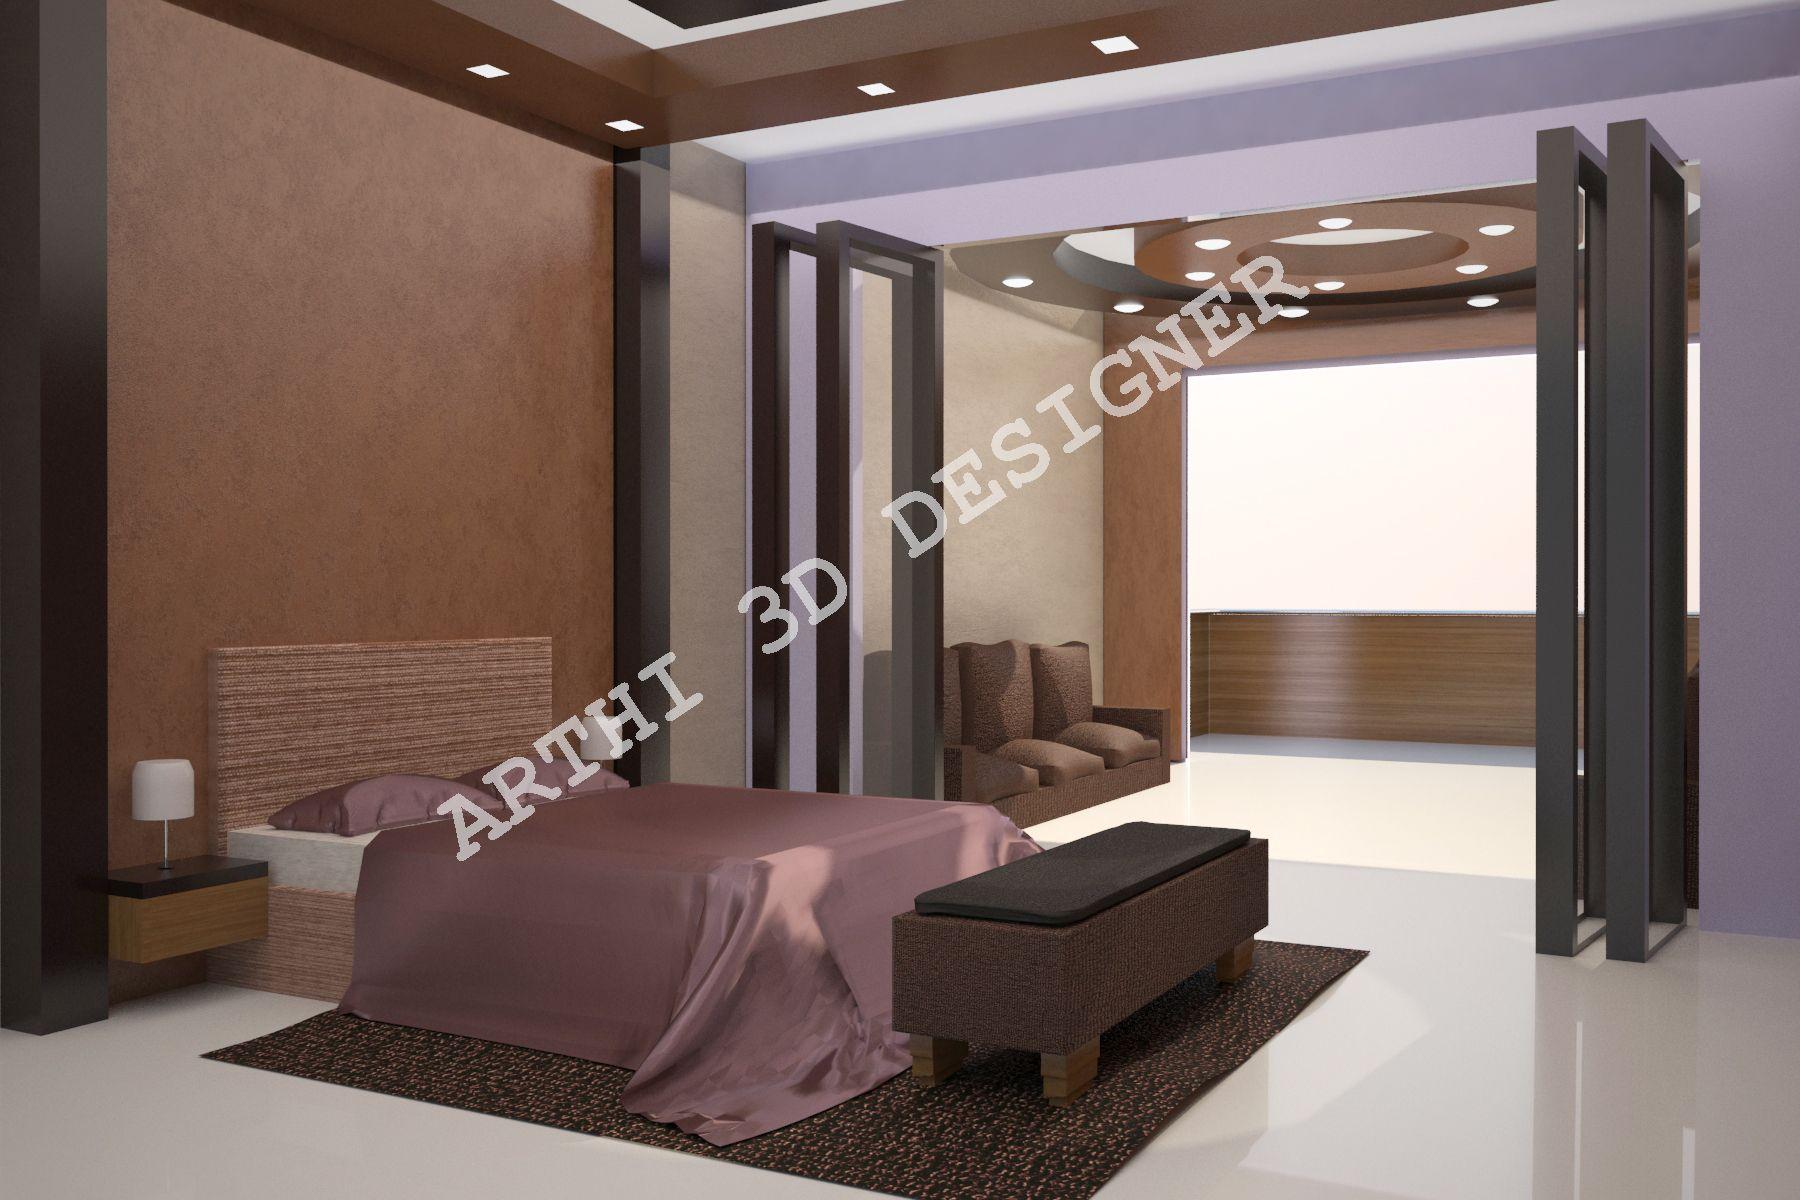 Realistic 3d Architectural Modular Bed Room Design Interior